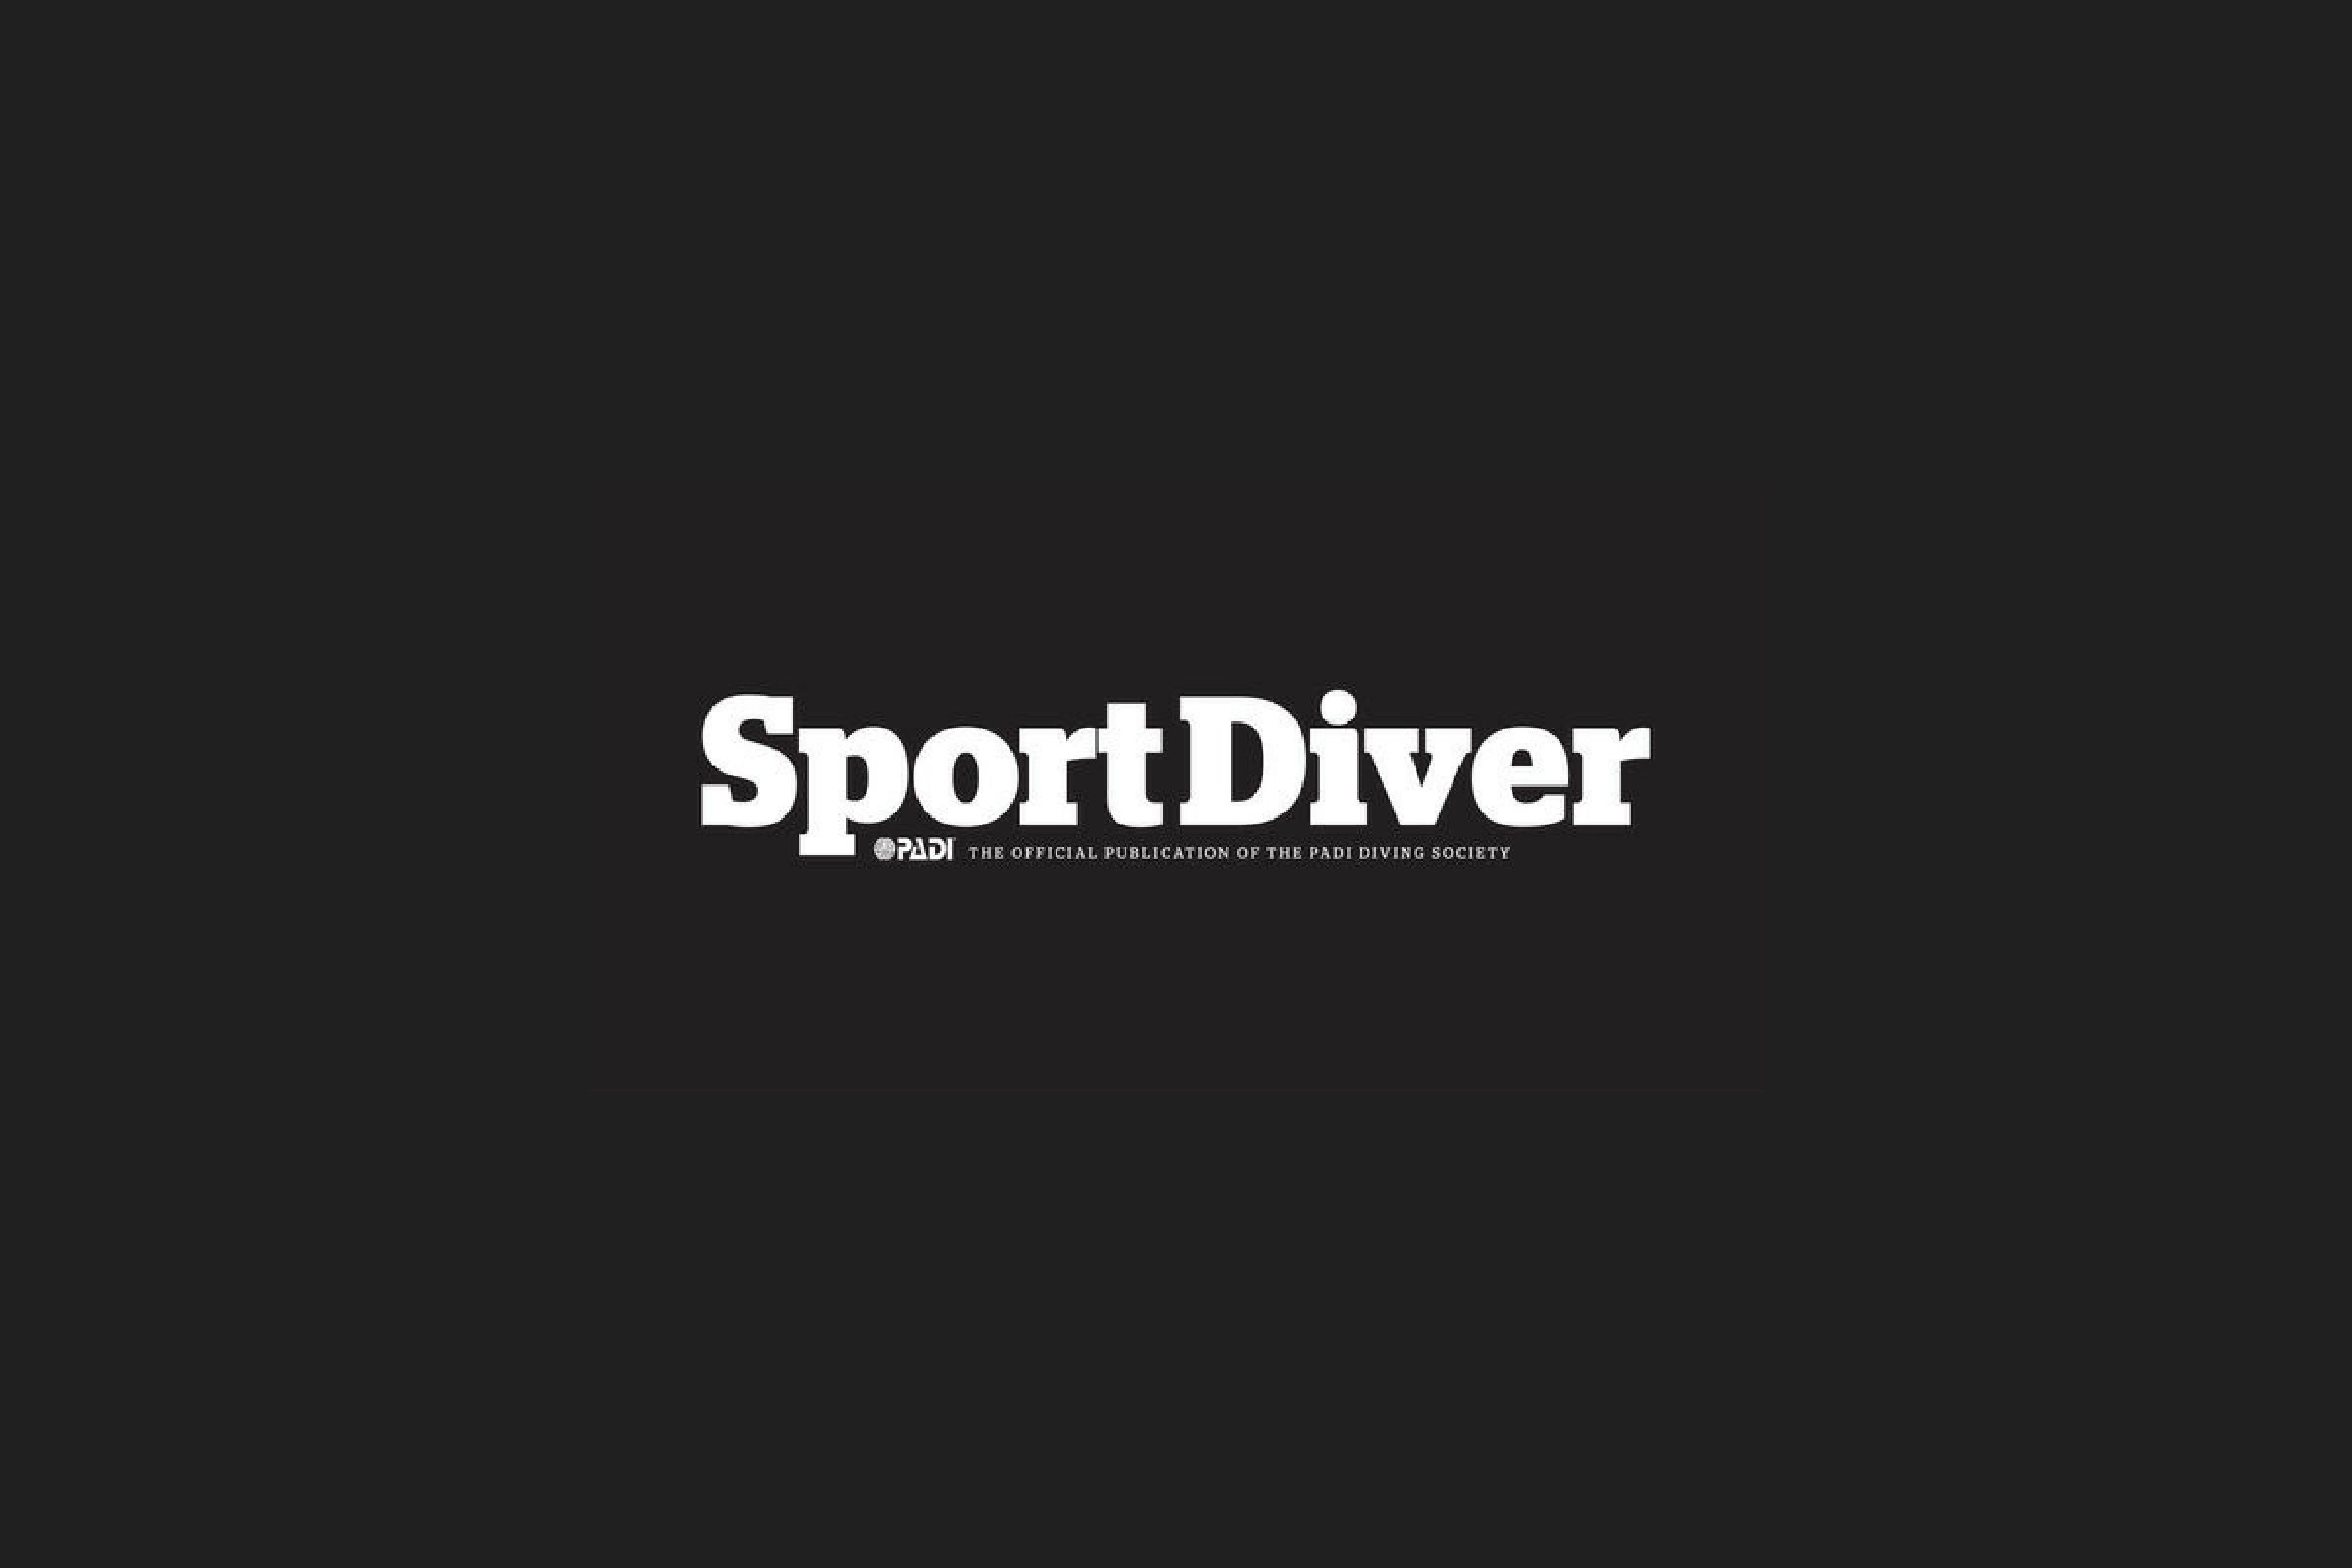 Sport Diver logo